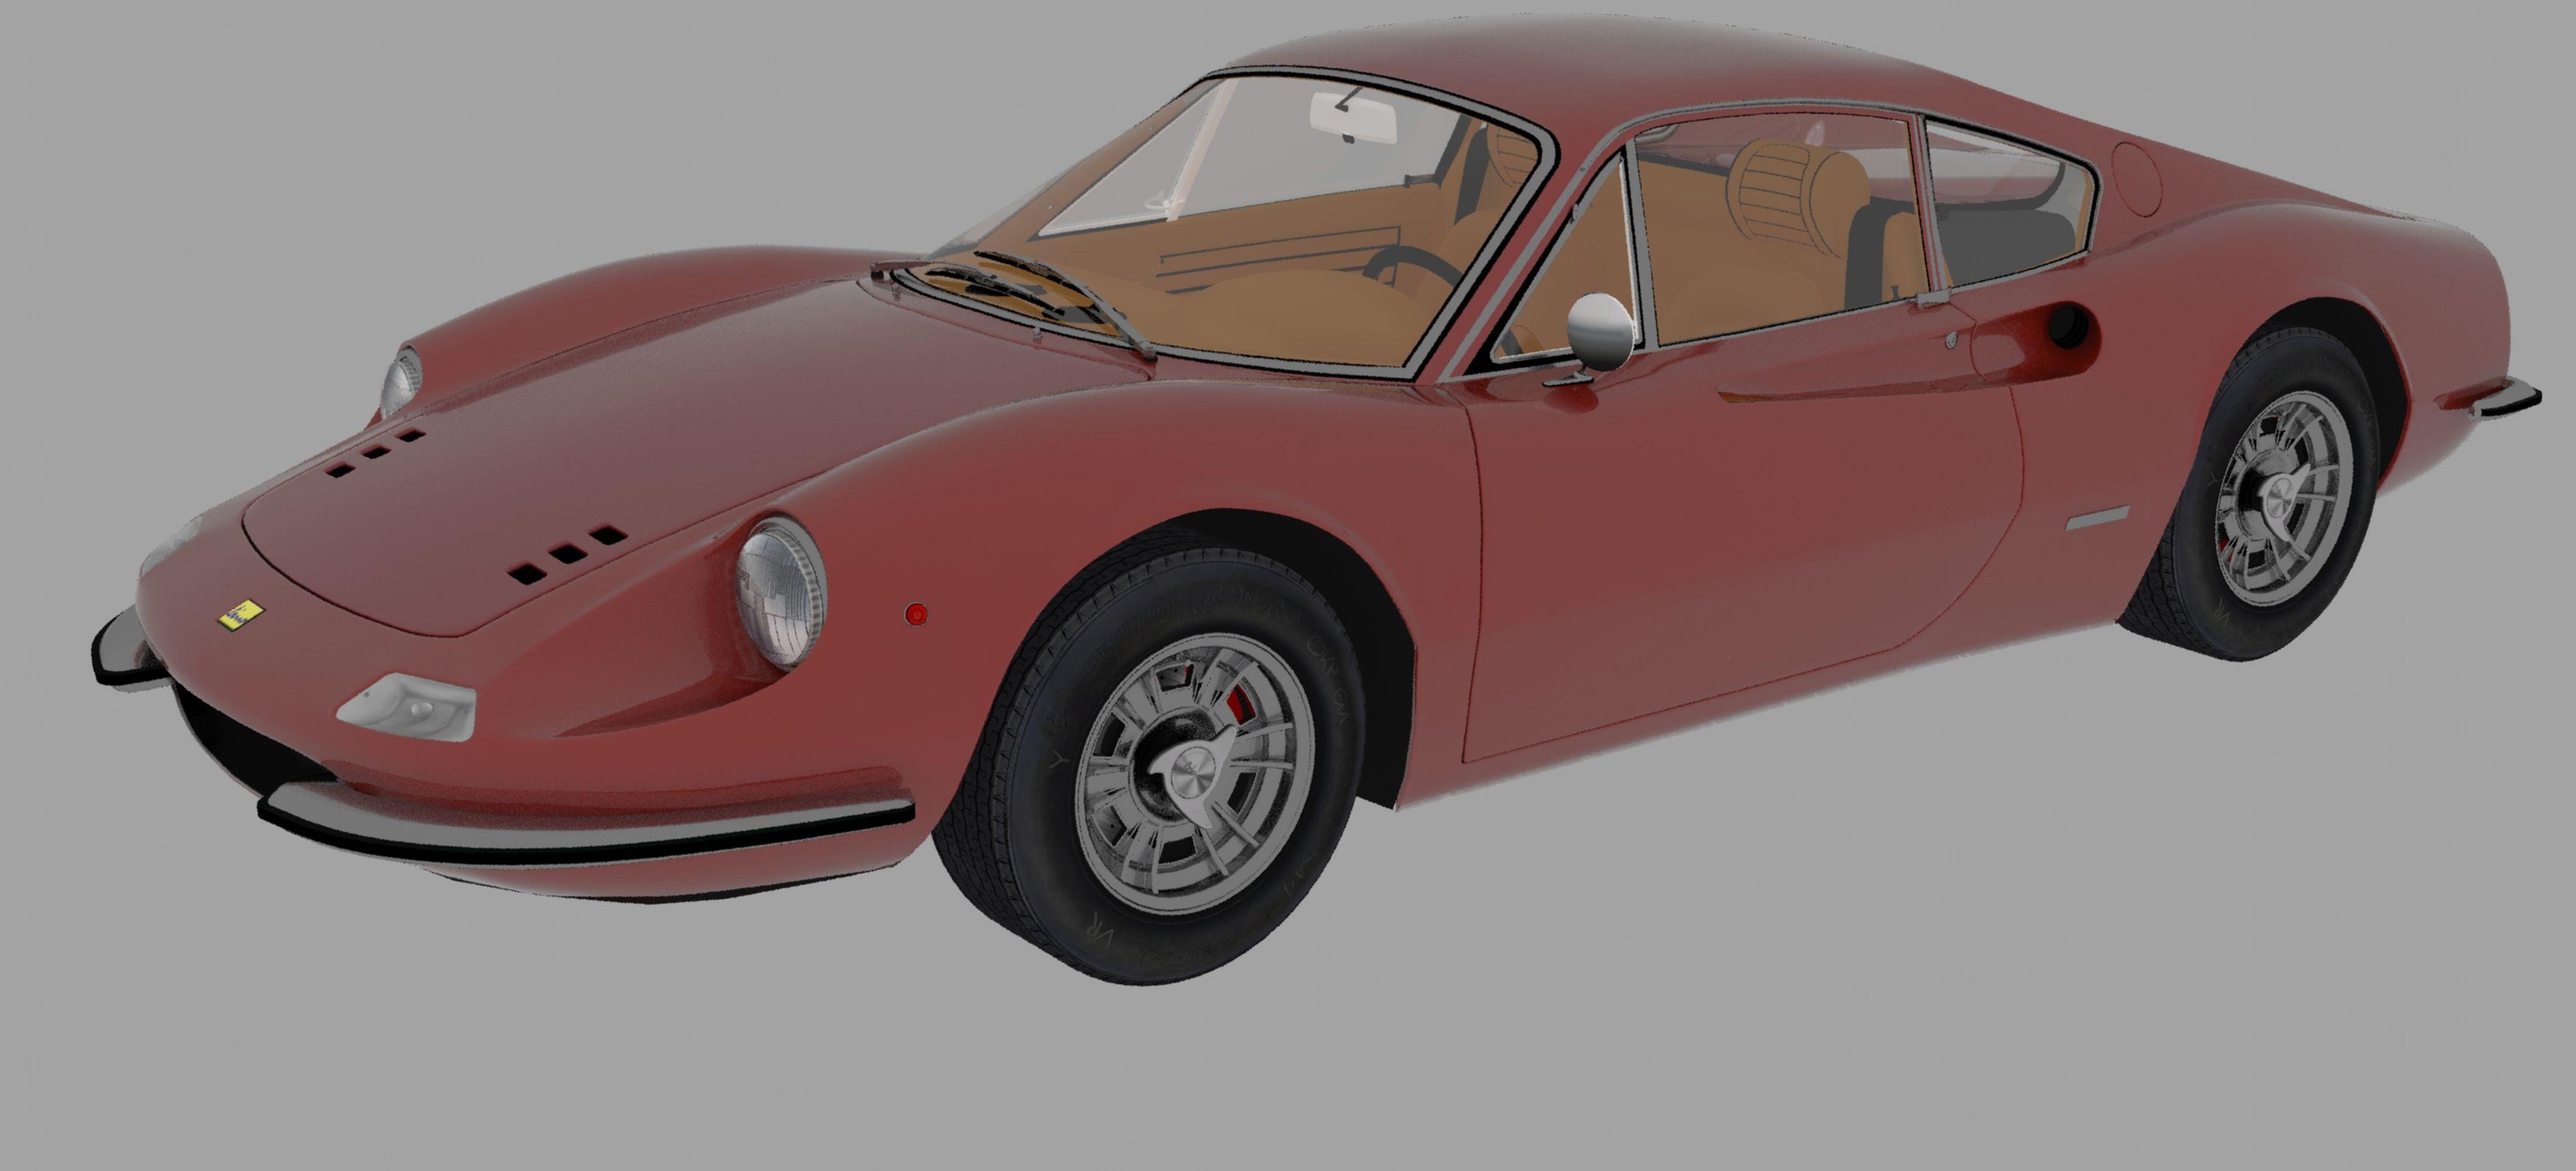 Ferrari-dino-246gt-1-3500-3500